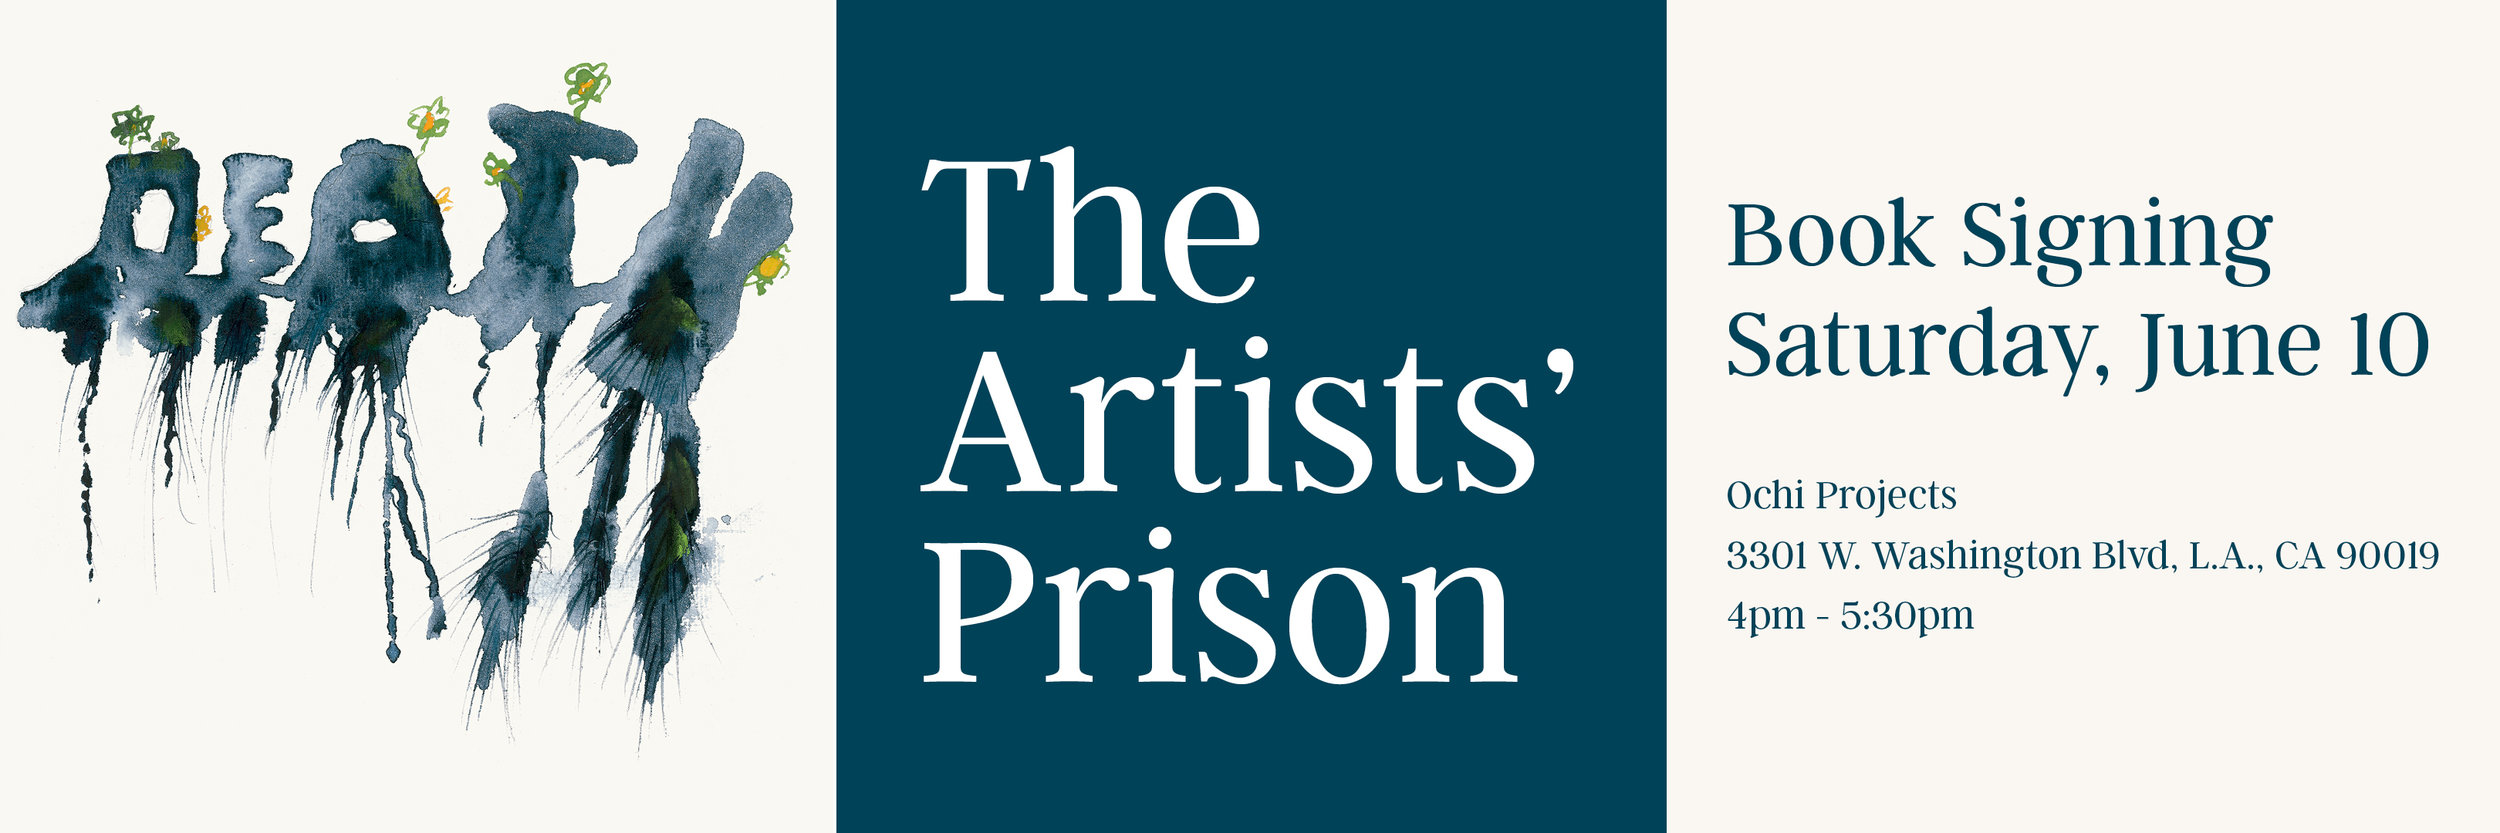 The Artists Prison book signing 10jun17.jpg